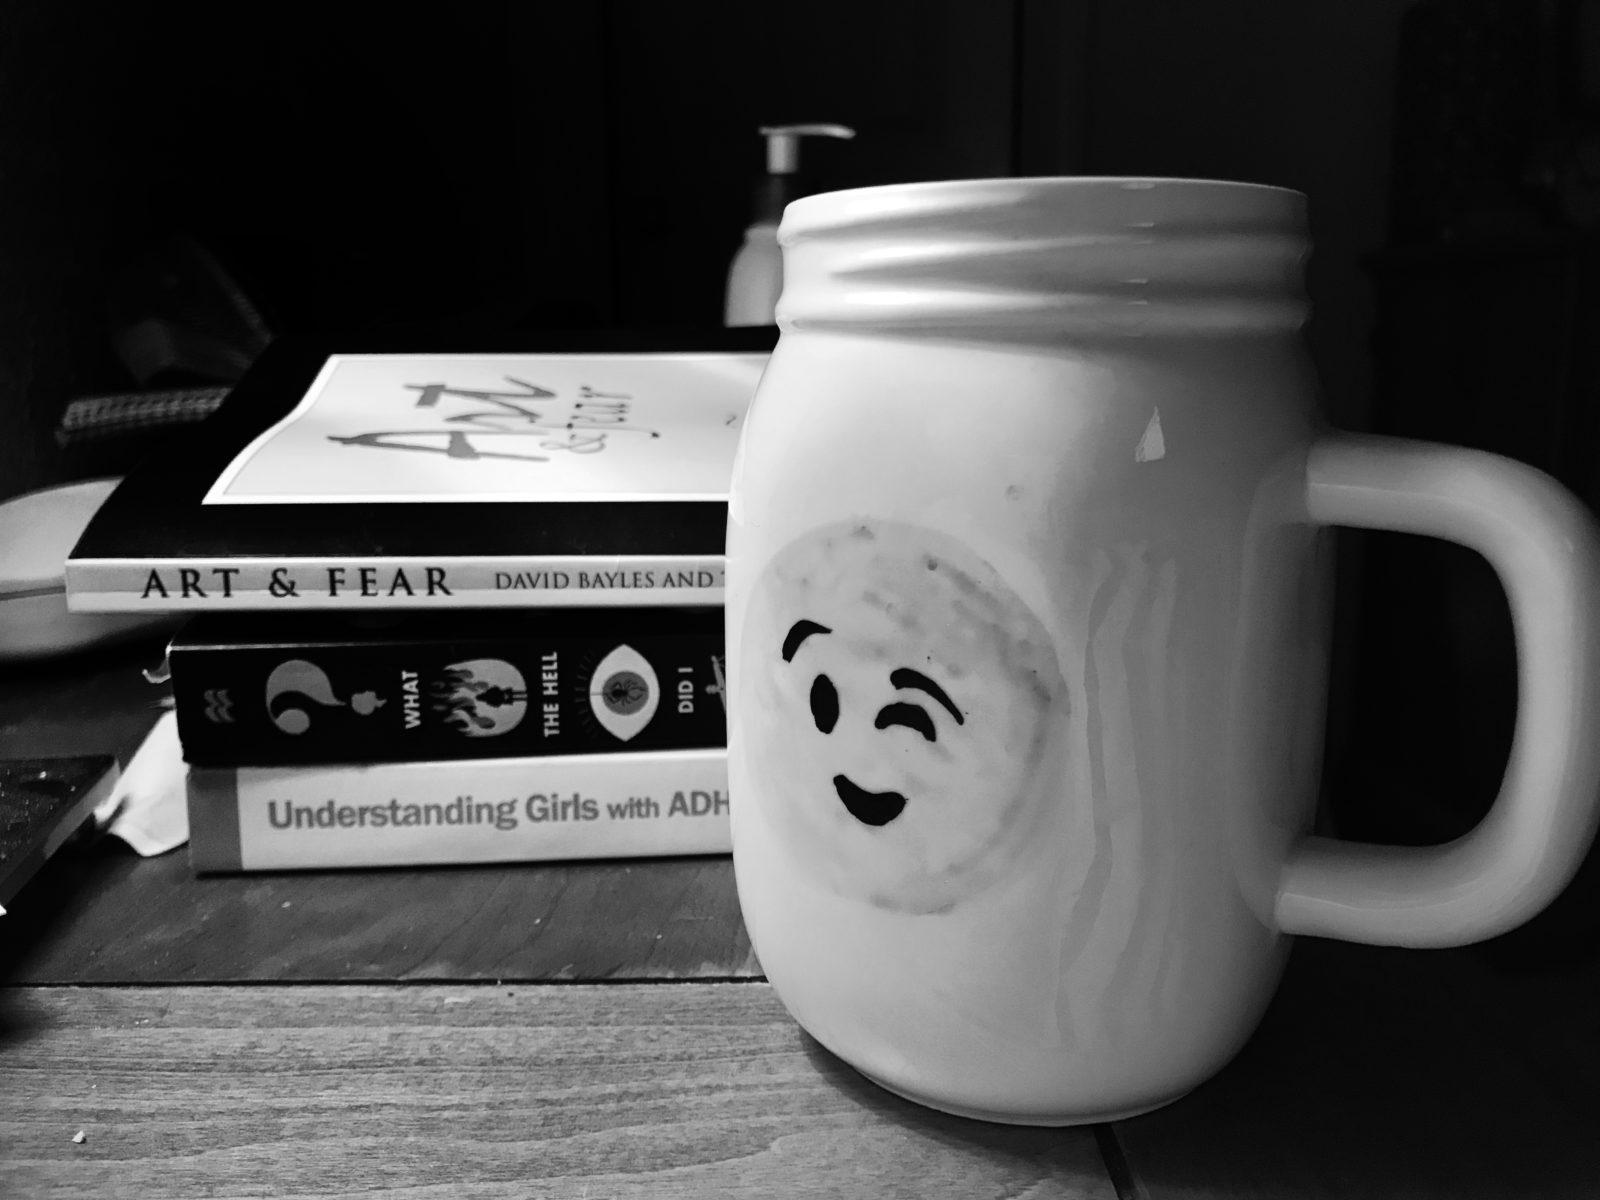 tea on the nightstand